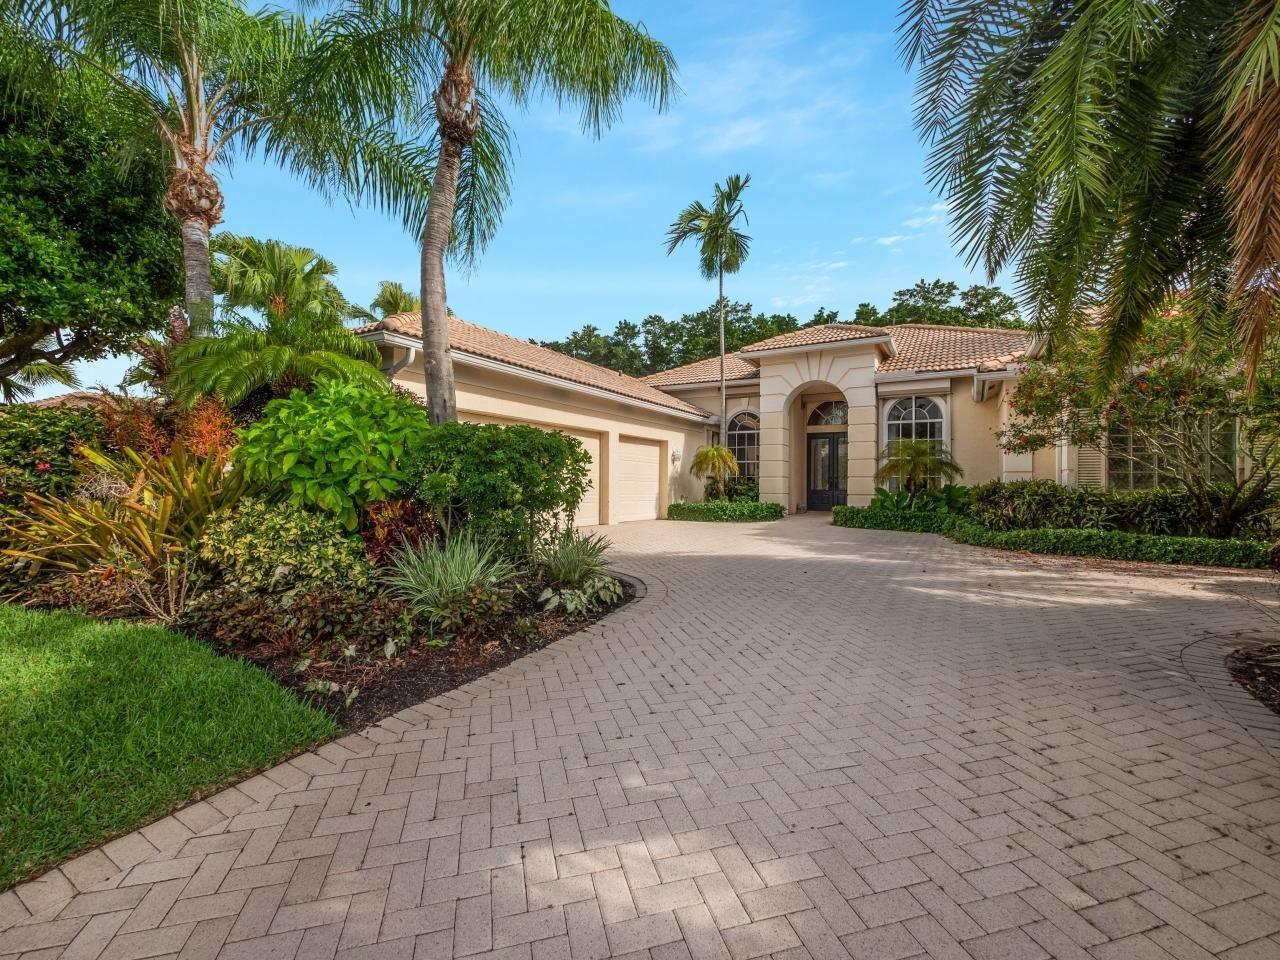 Photo of 25 Bermuda Lake Drive, Palm Beach Gardens, FL 33418 (MLS # RX-10722469)